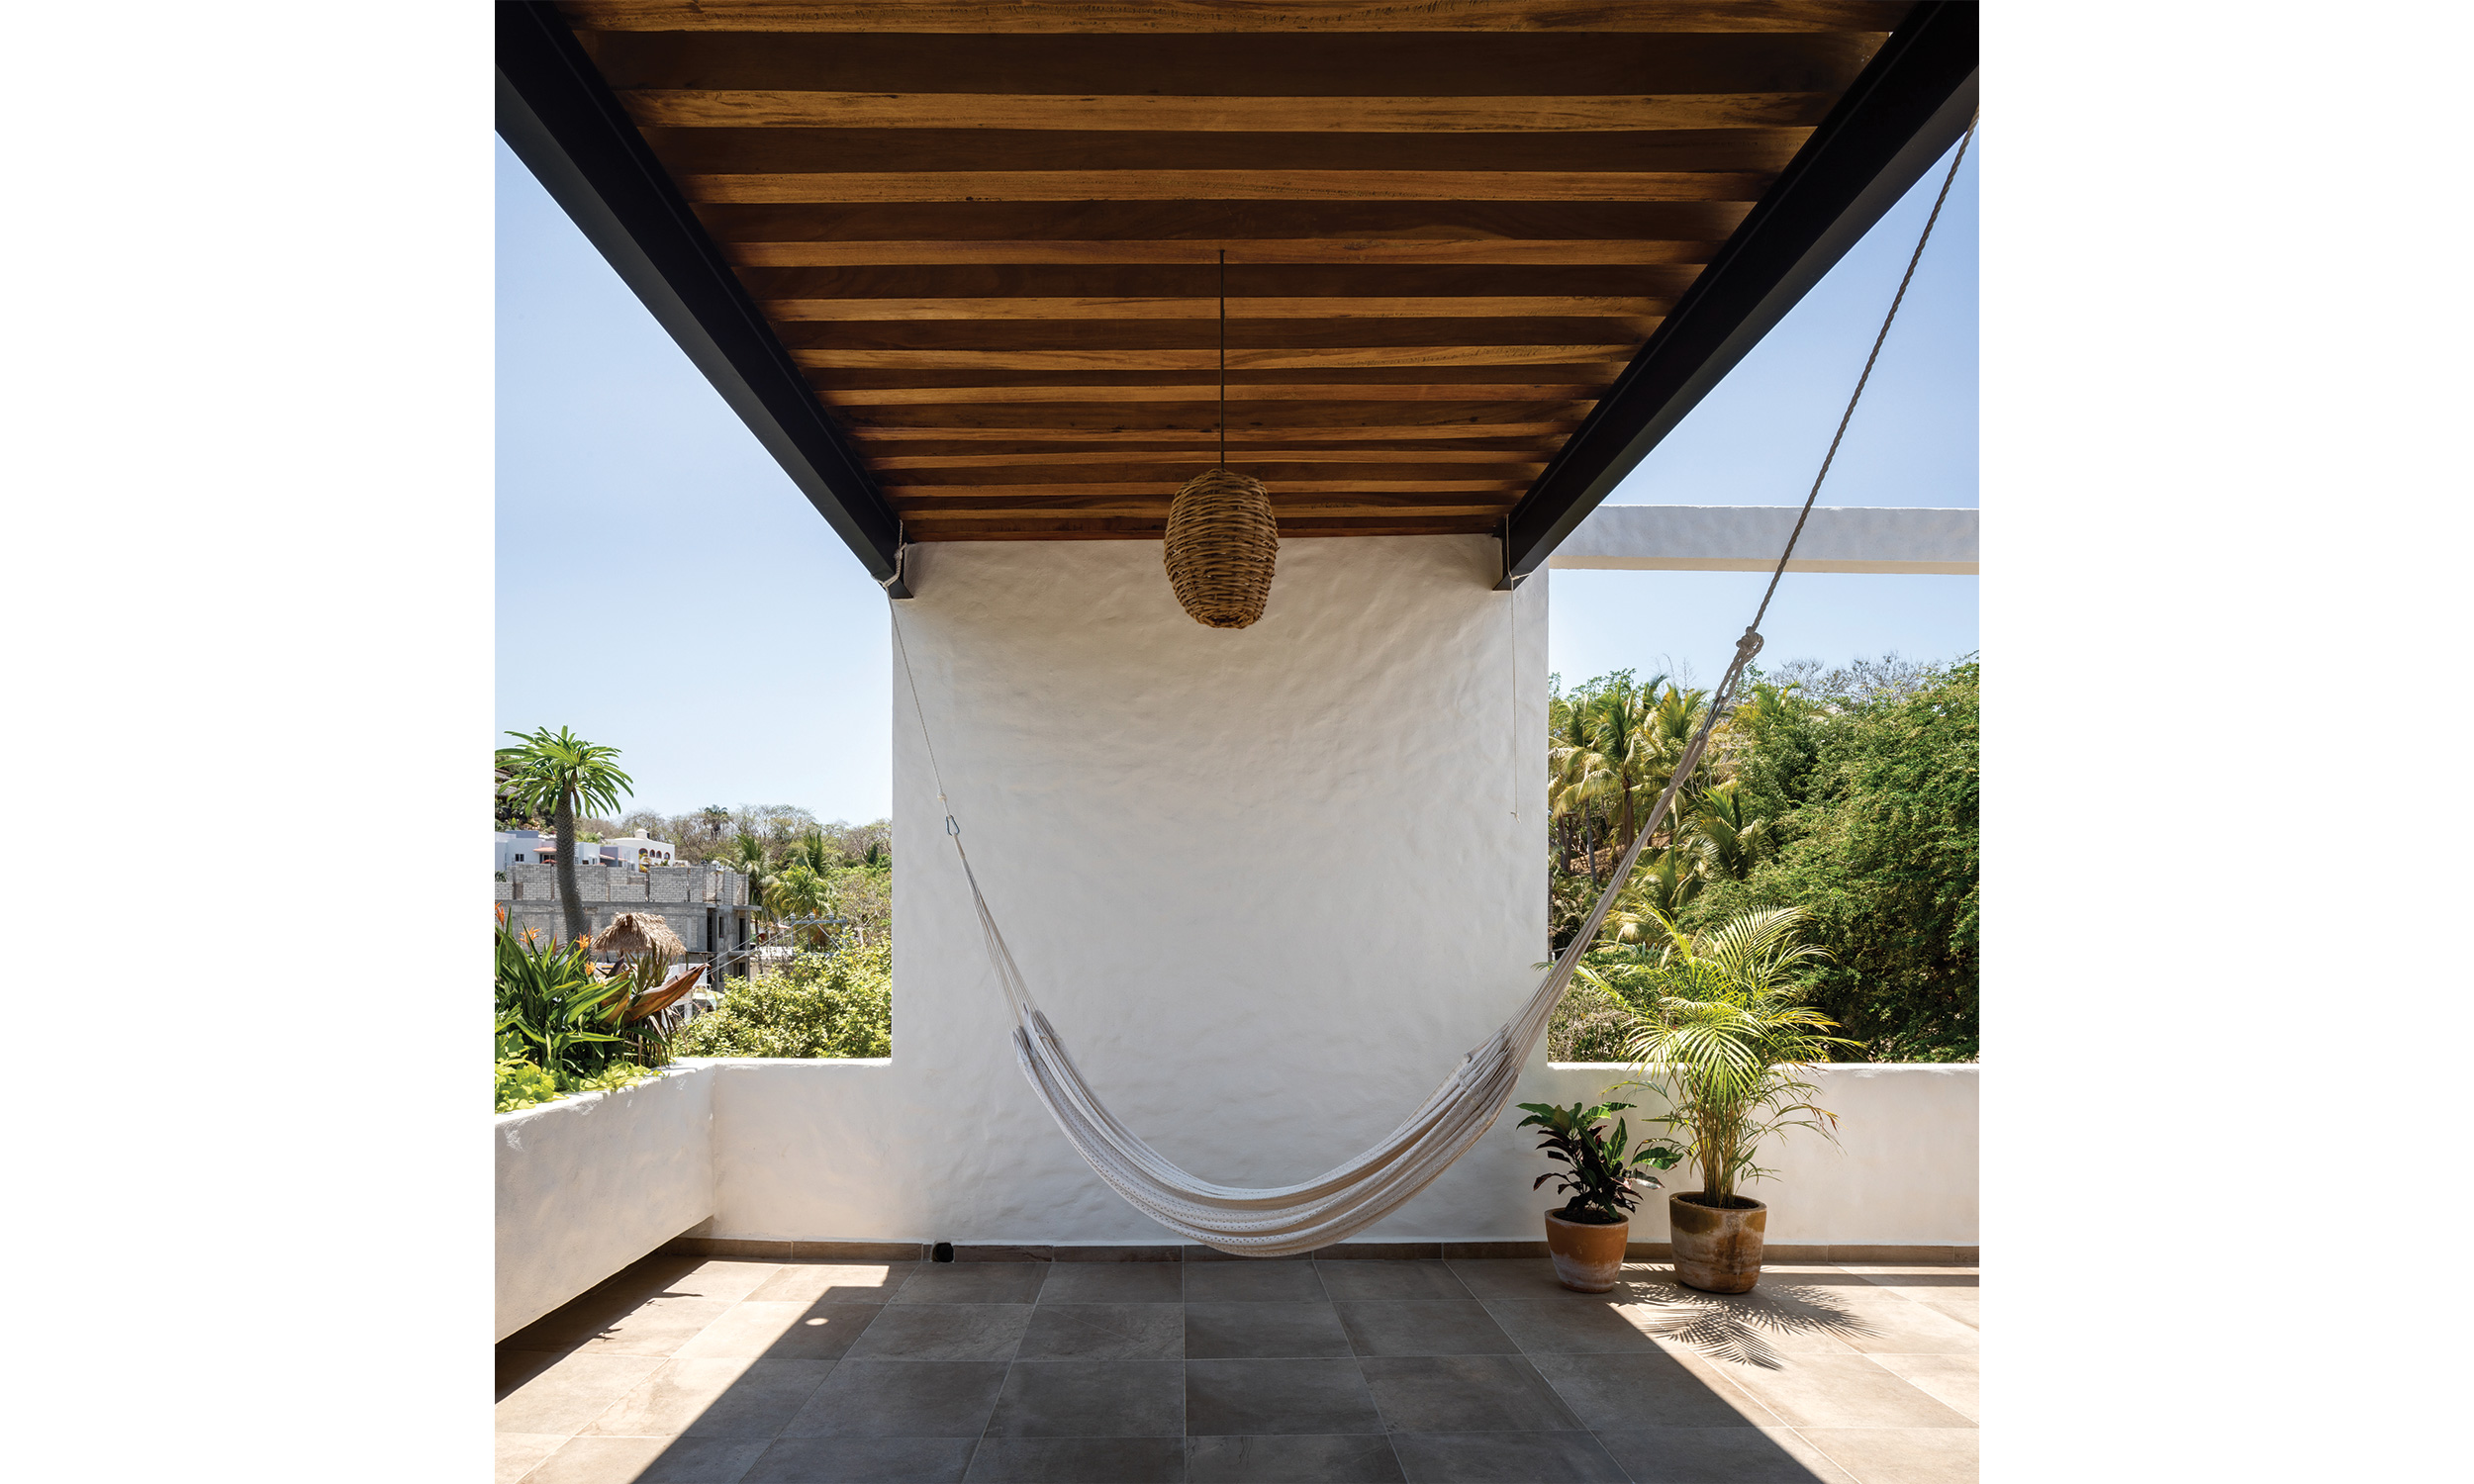 main_office_casa_galería_rafaél_gamo_1176_hammock